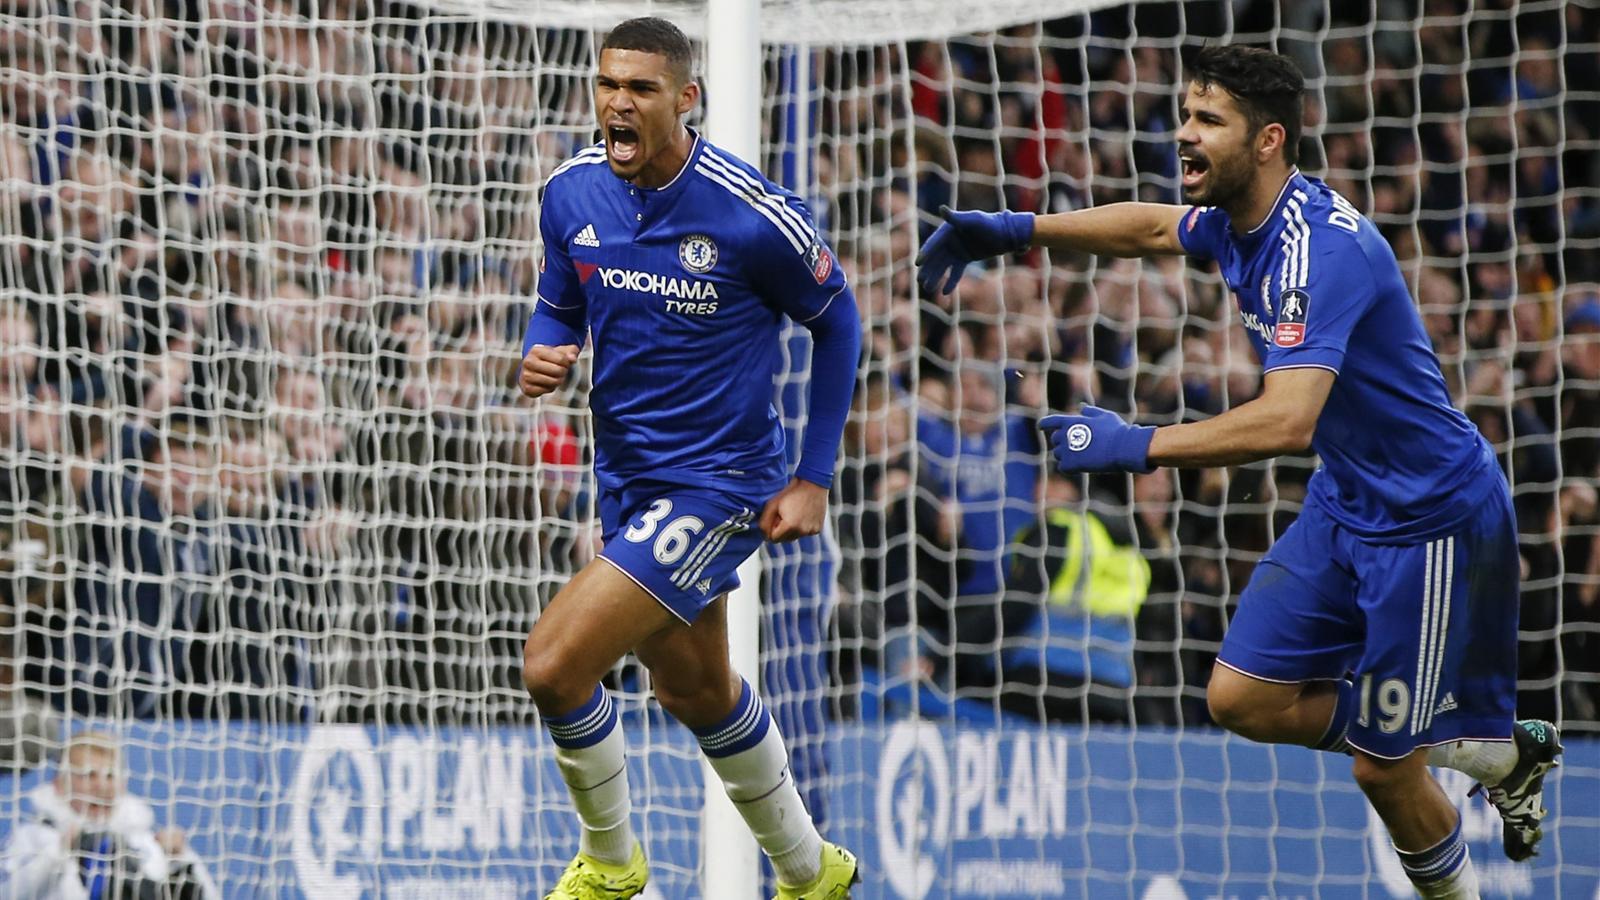 Ruben Loftus Cheek Scores First Chelsea Goal In Third Round Win Over Scunthorpe